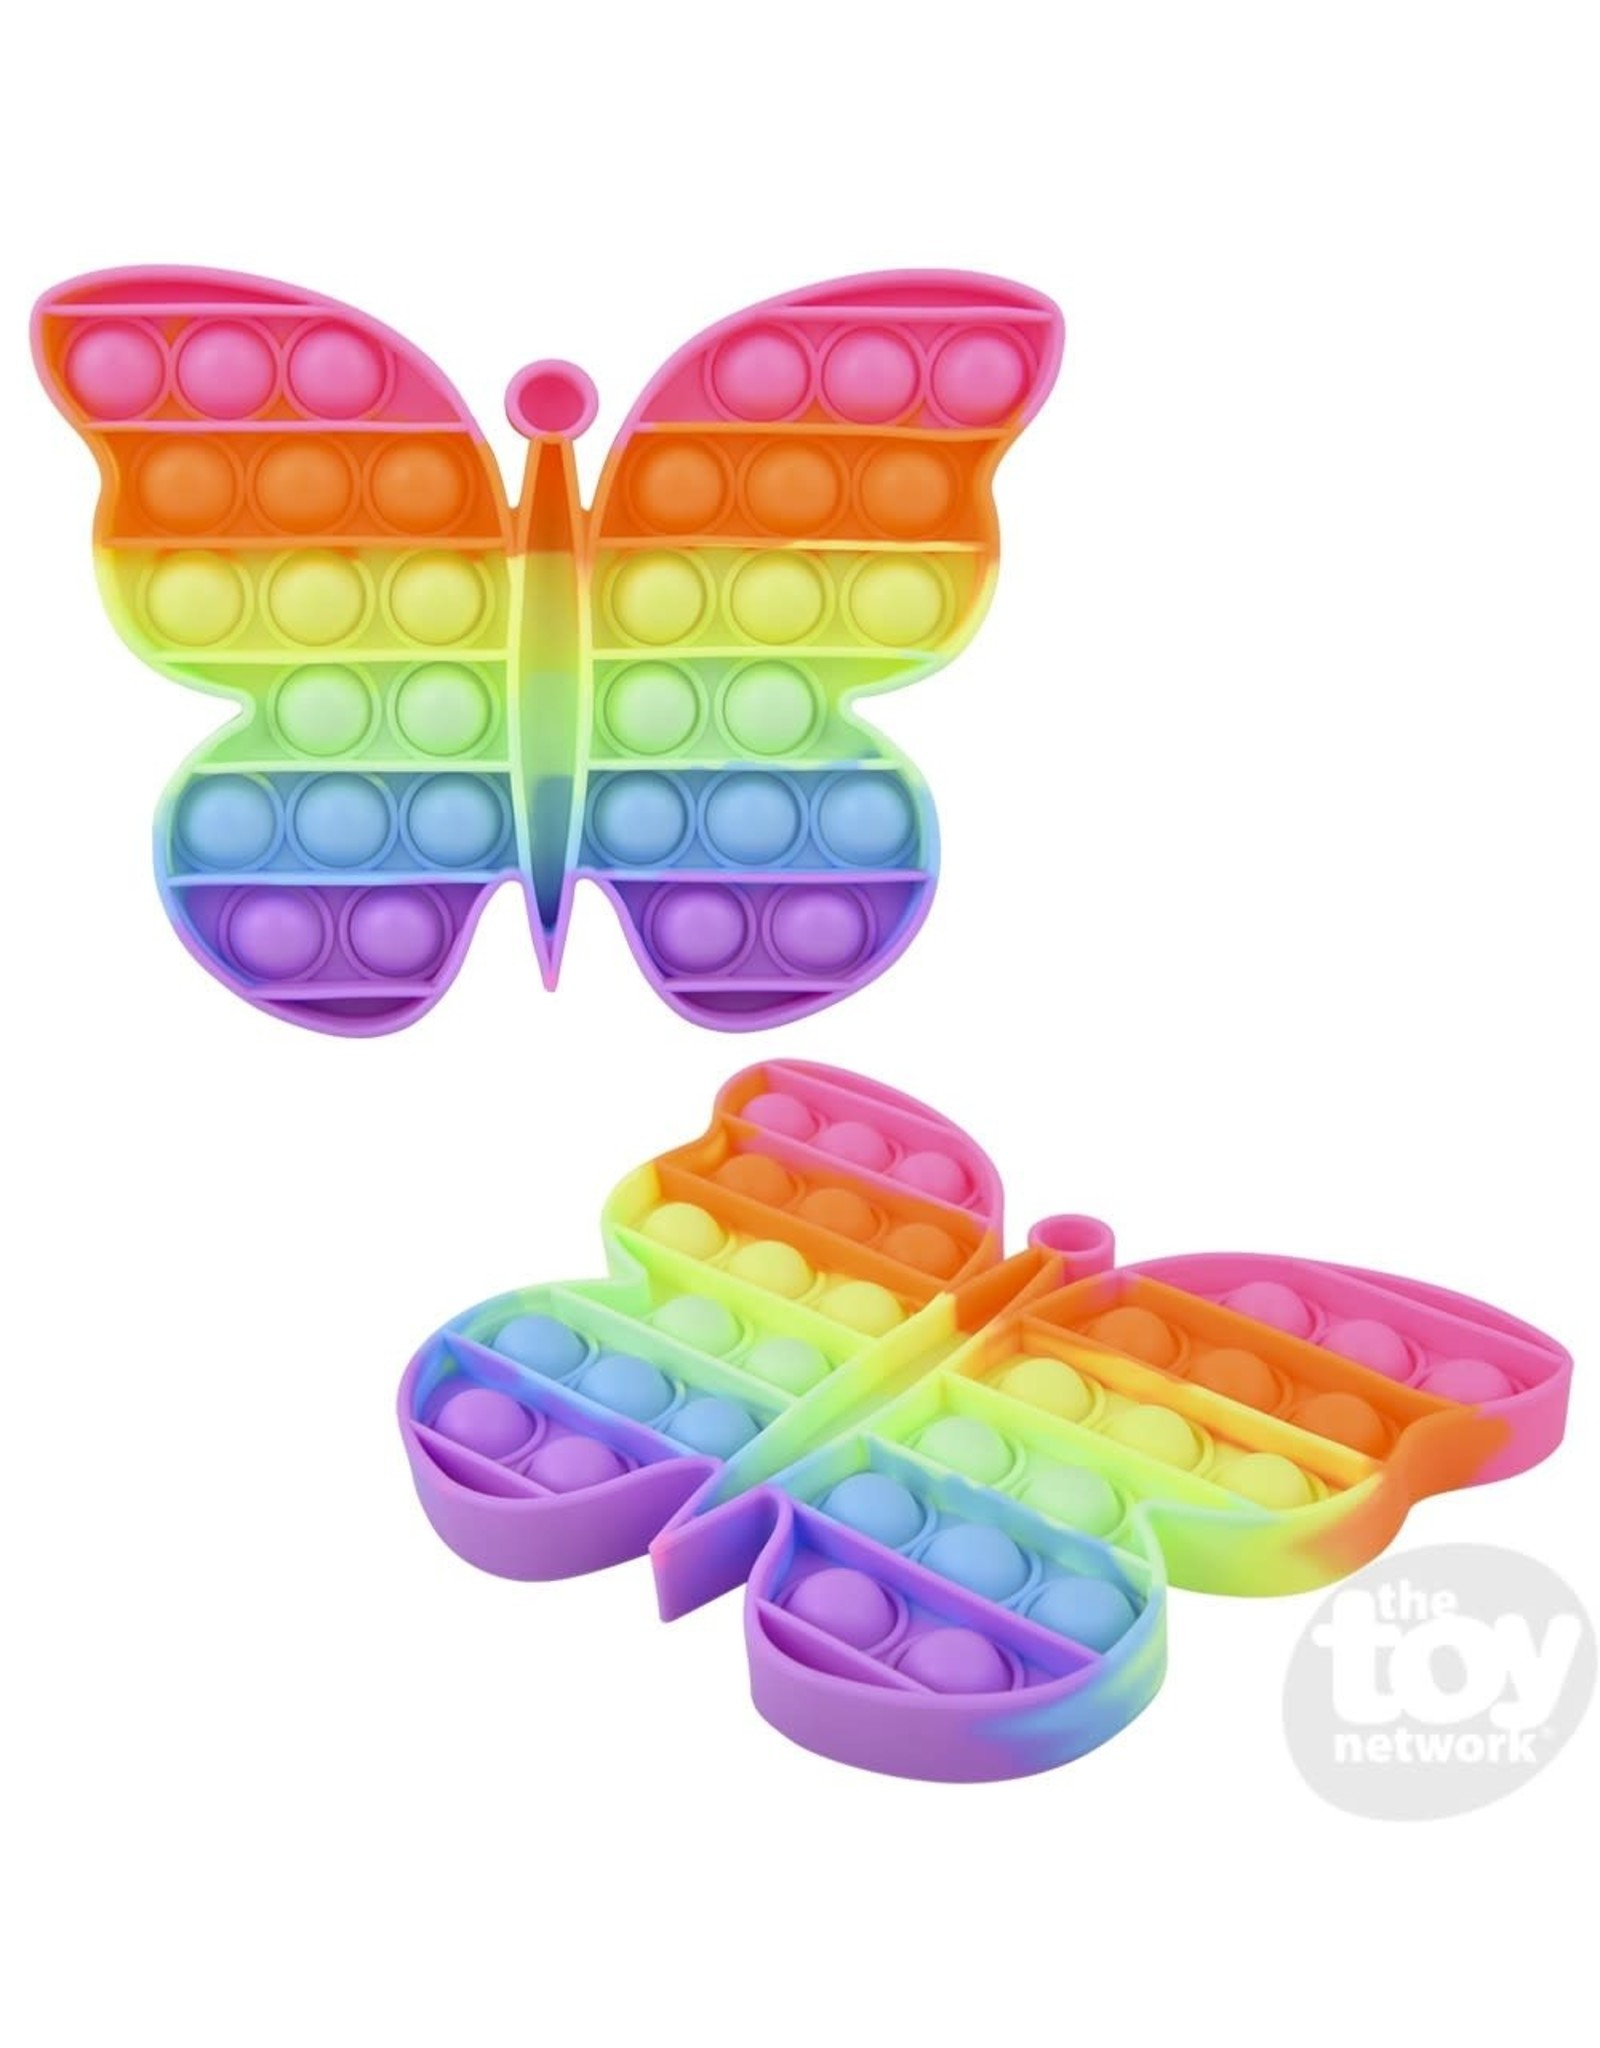 "The Toy Network 6.5"" Neon Butterfly Bubble Popper"